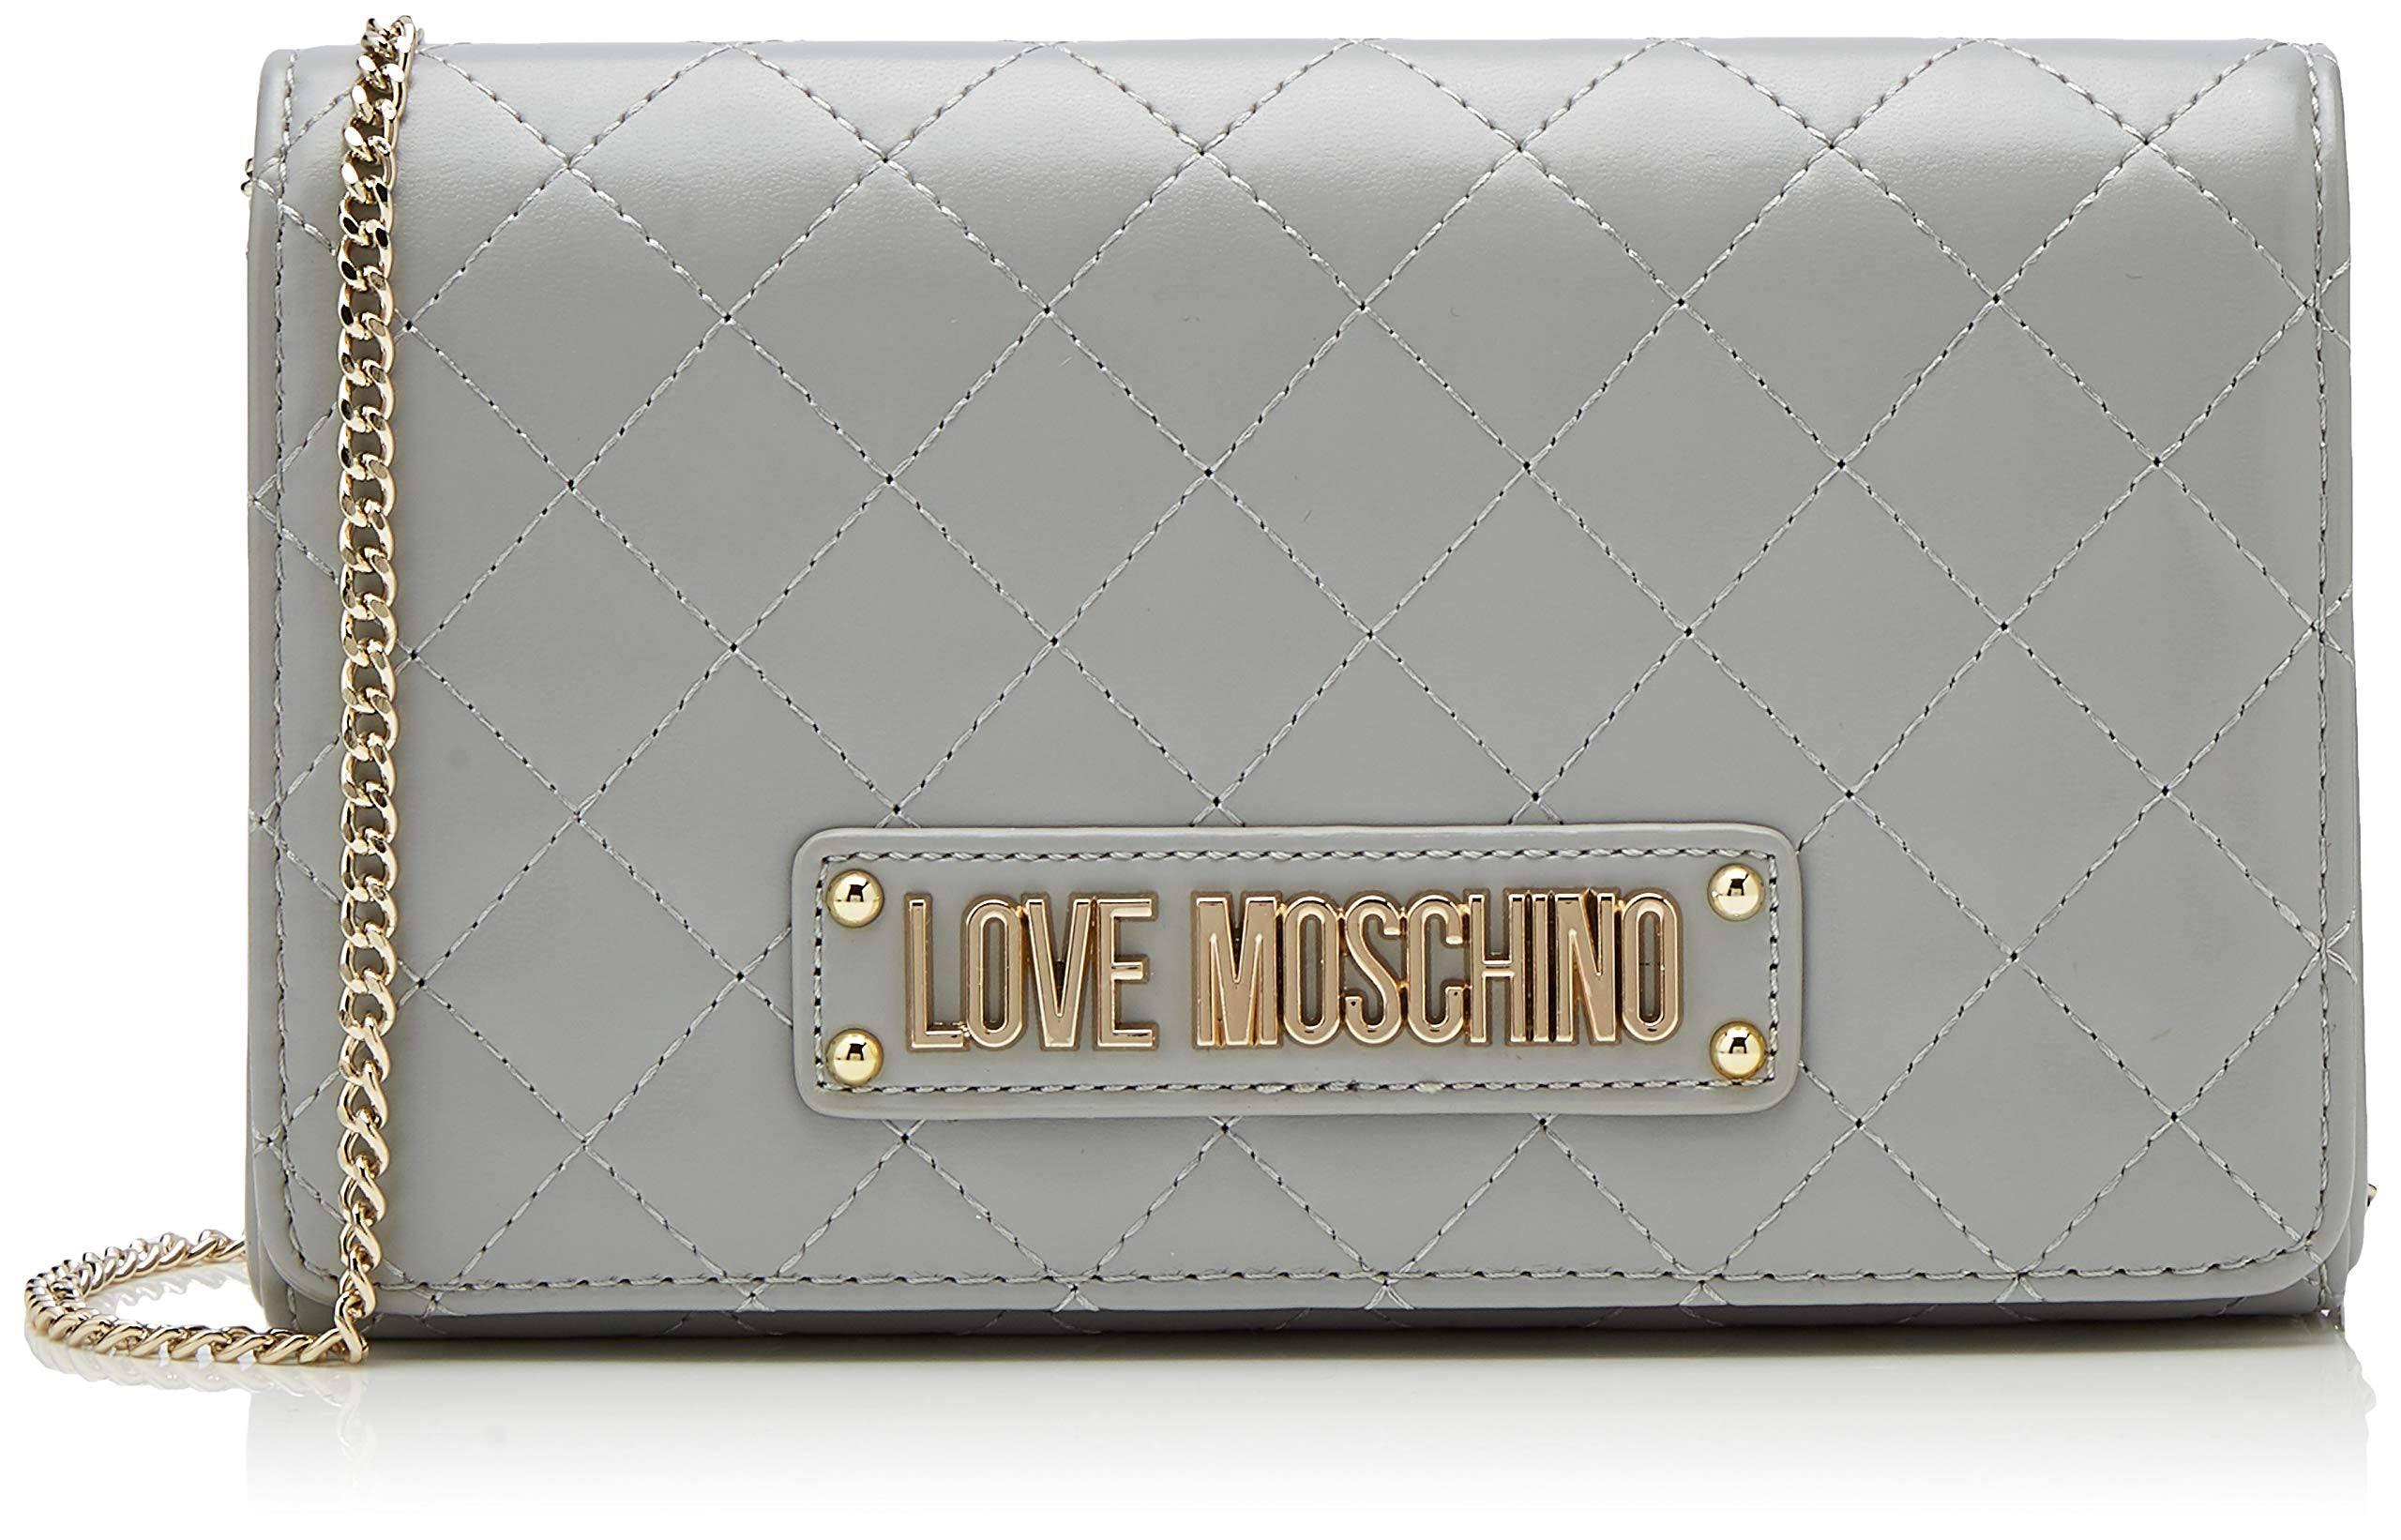 Damen Clutch15x10x15 Moschino Pu Love Graugrigio Quilted Nappa Centimeters qUzVpSLMG